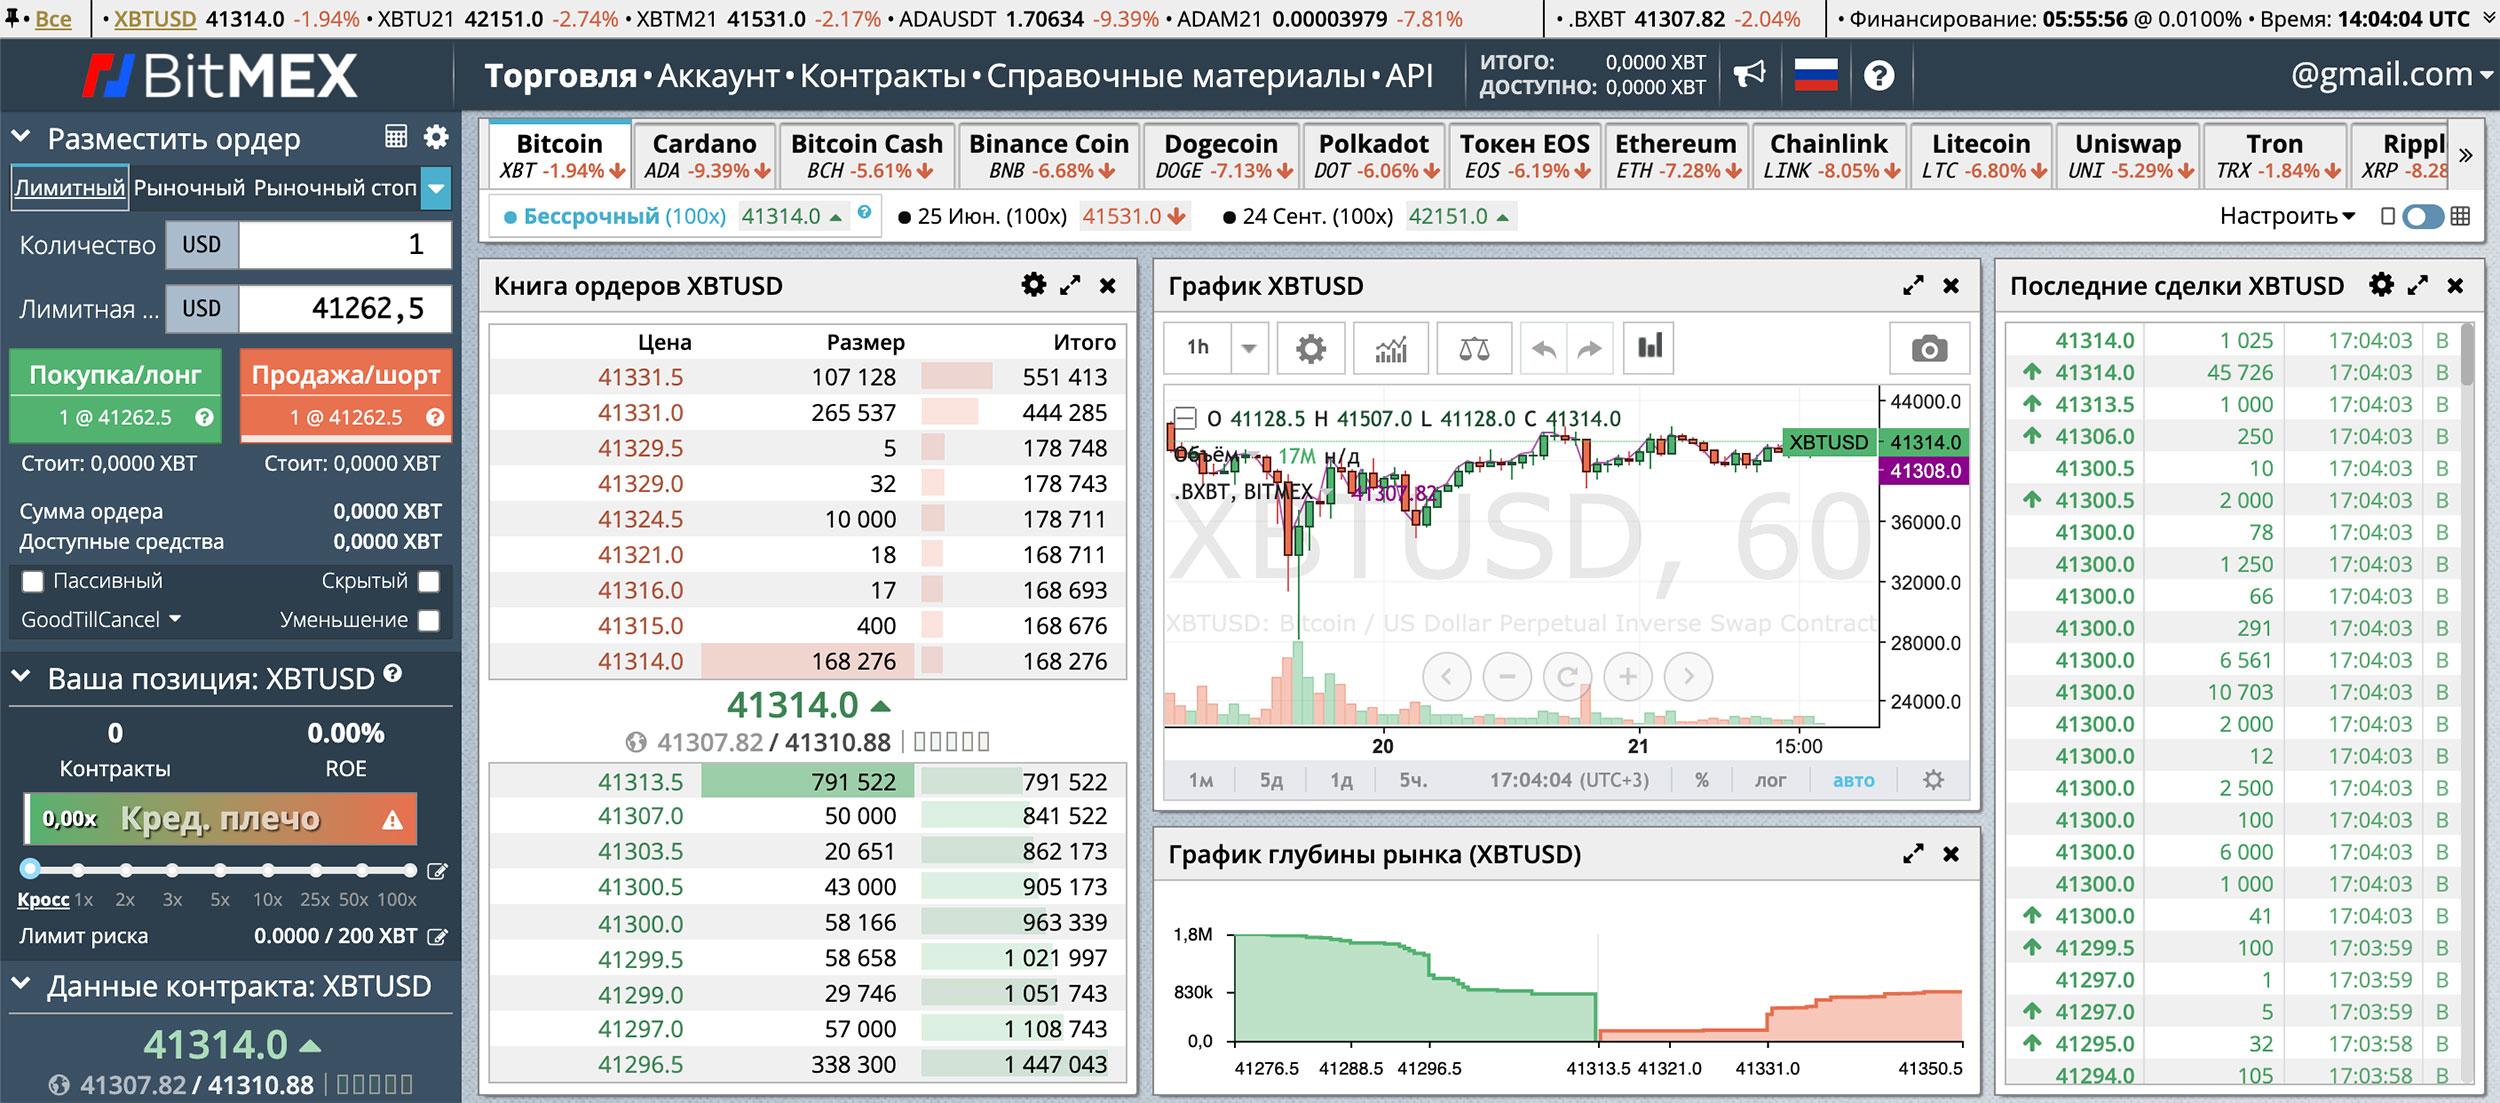 биржа криптовалют bitmex платформа интерфейс